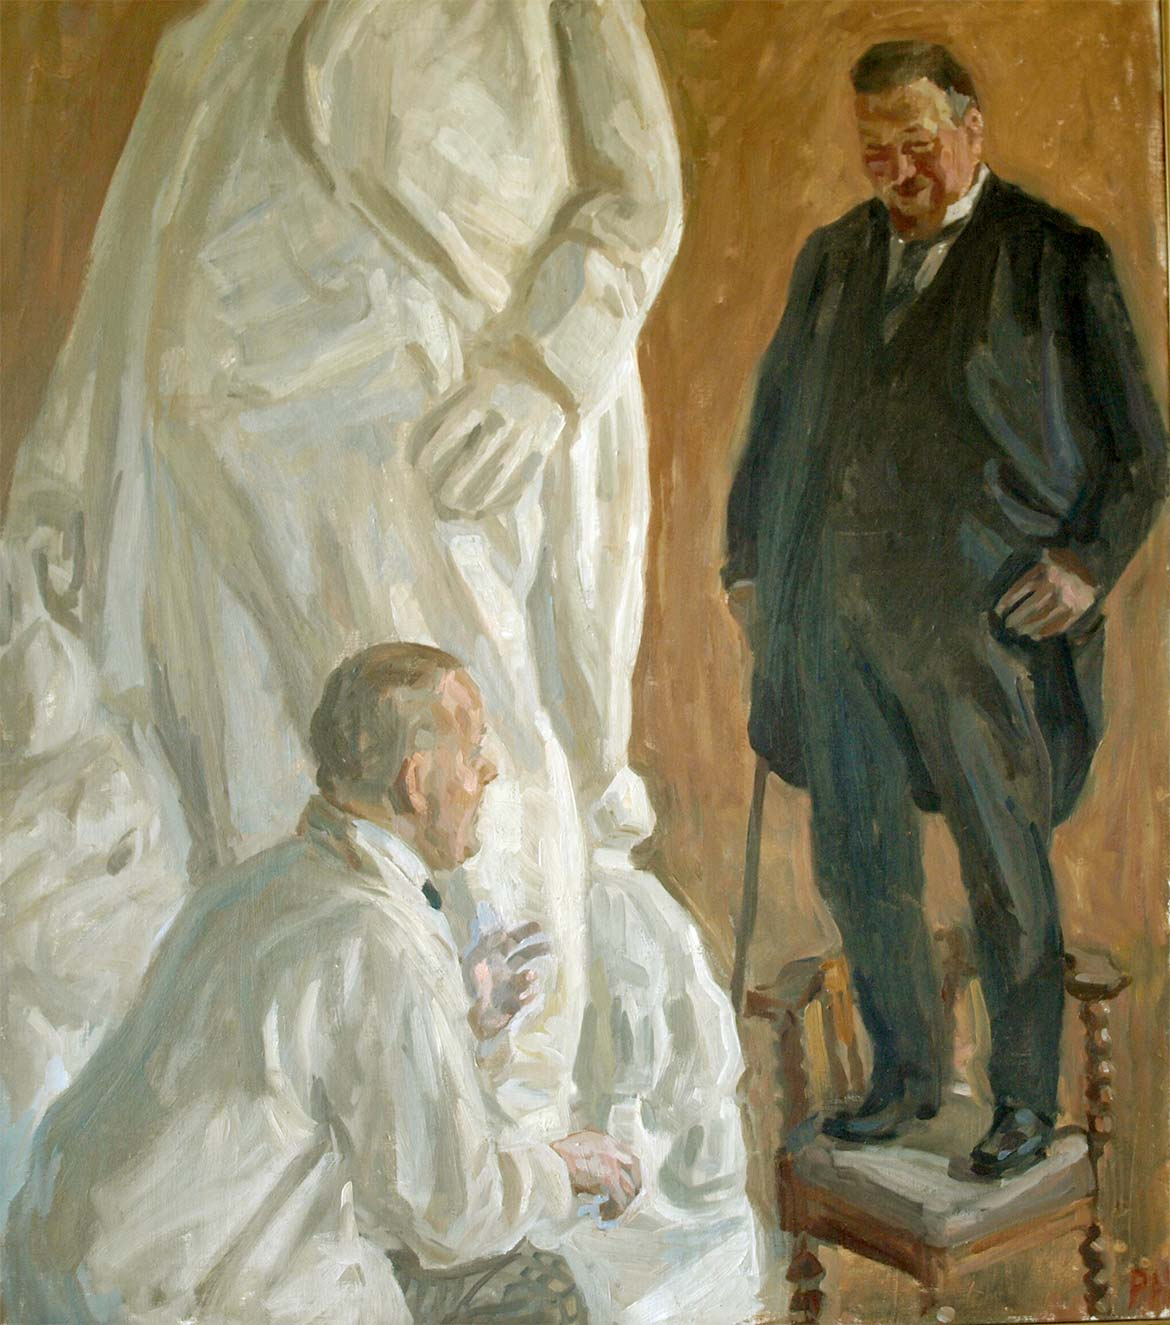 Peter Hansen, Kai Nielsen Modelling Mads Rasmussen, 1913. Faaborg Museum.